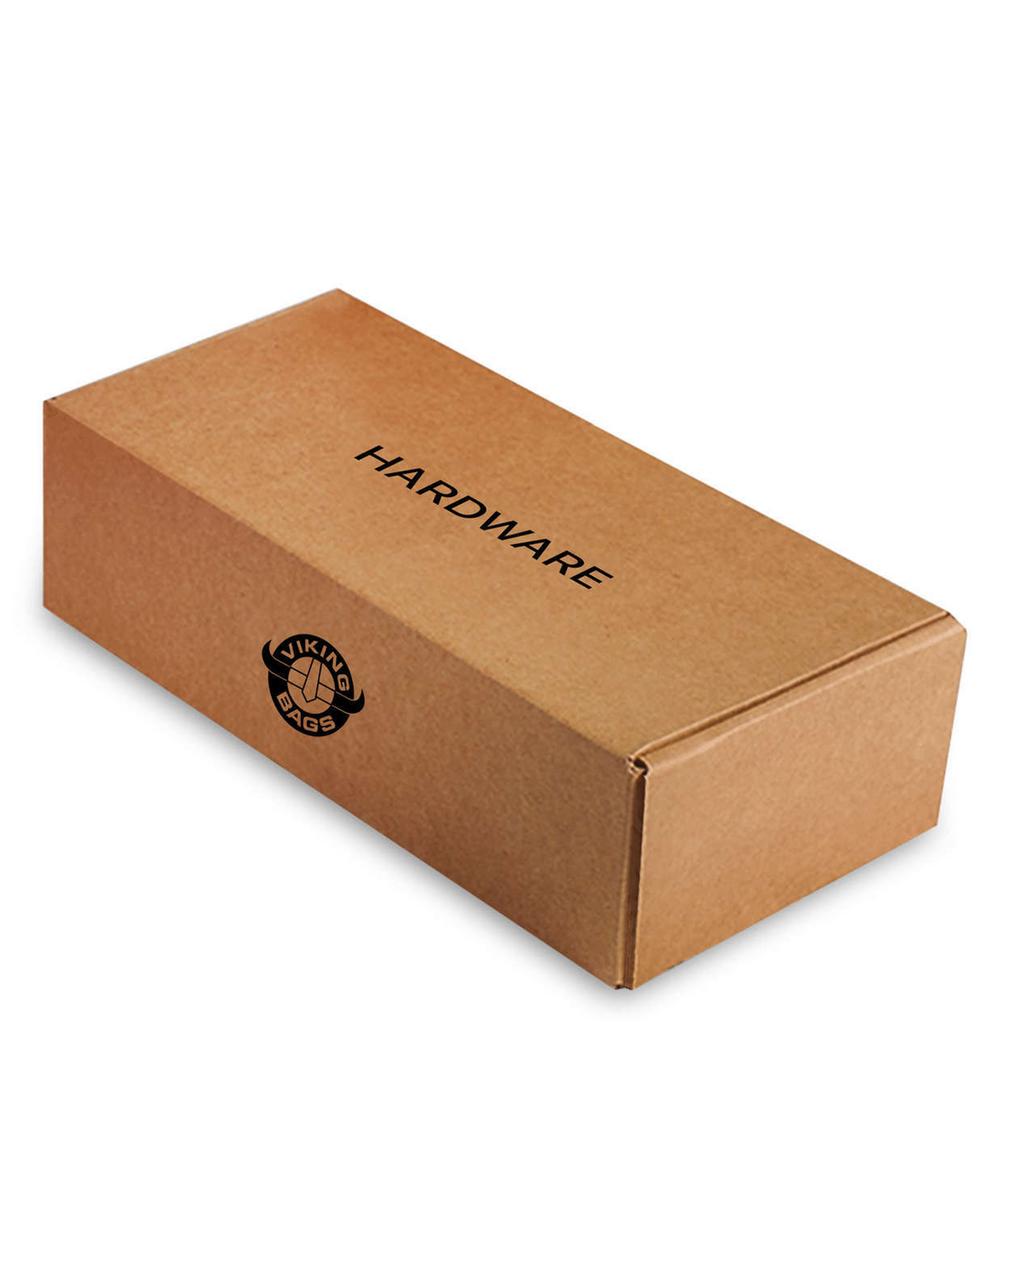 Honda 750 Shadow Phantom Medium Charger Slanted Motorcycle Saddlebags box